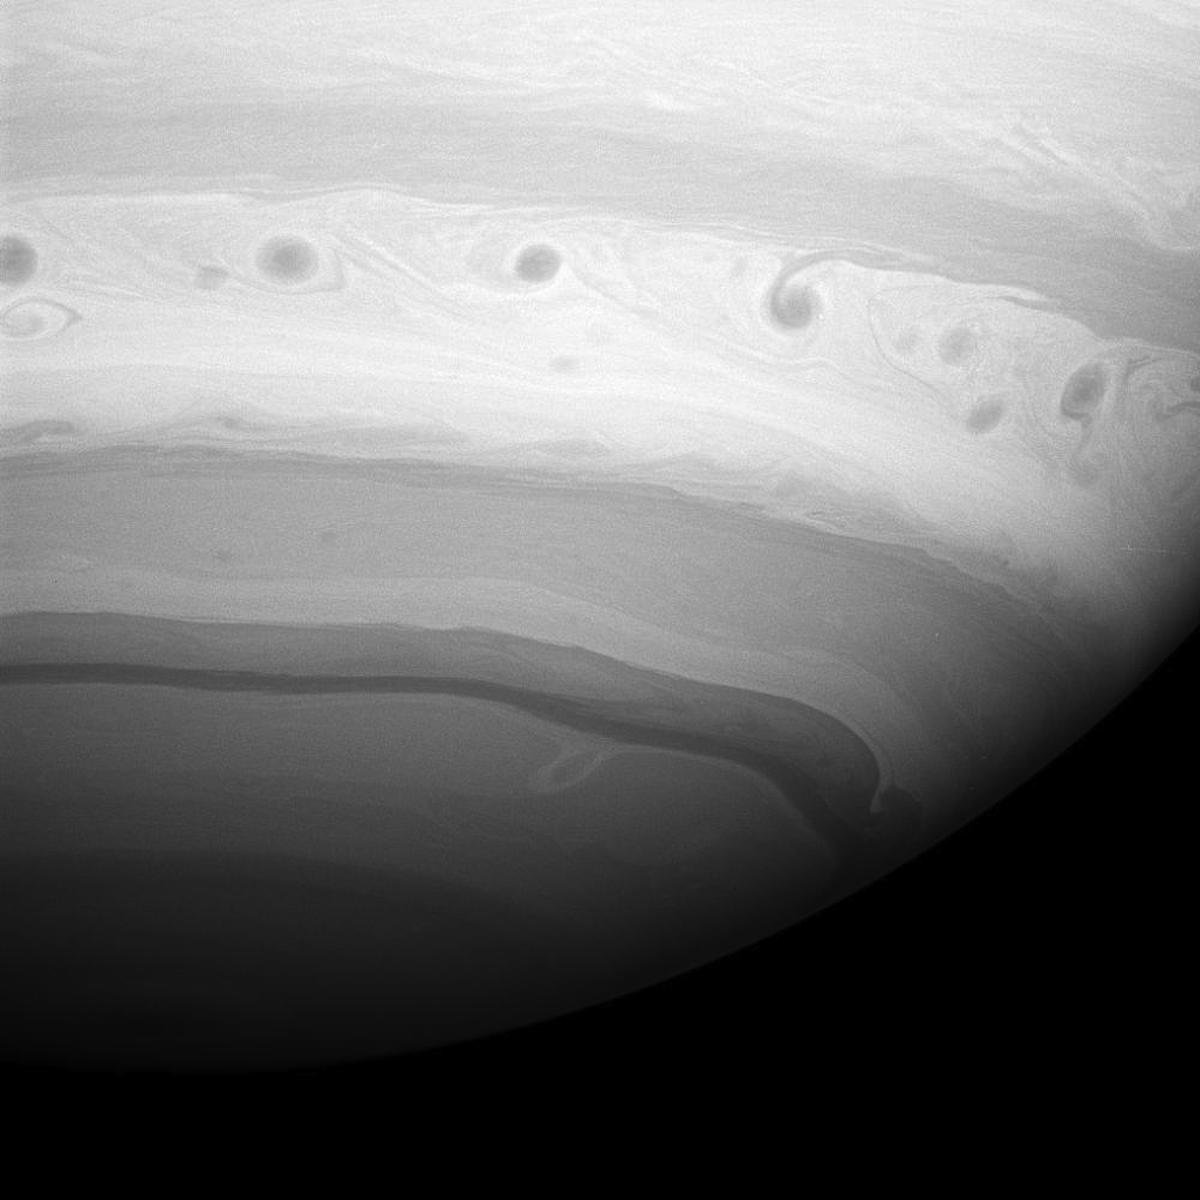 imagenes nunca vistas de saturno tomadas por la sonda cassini 10